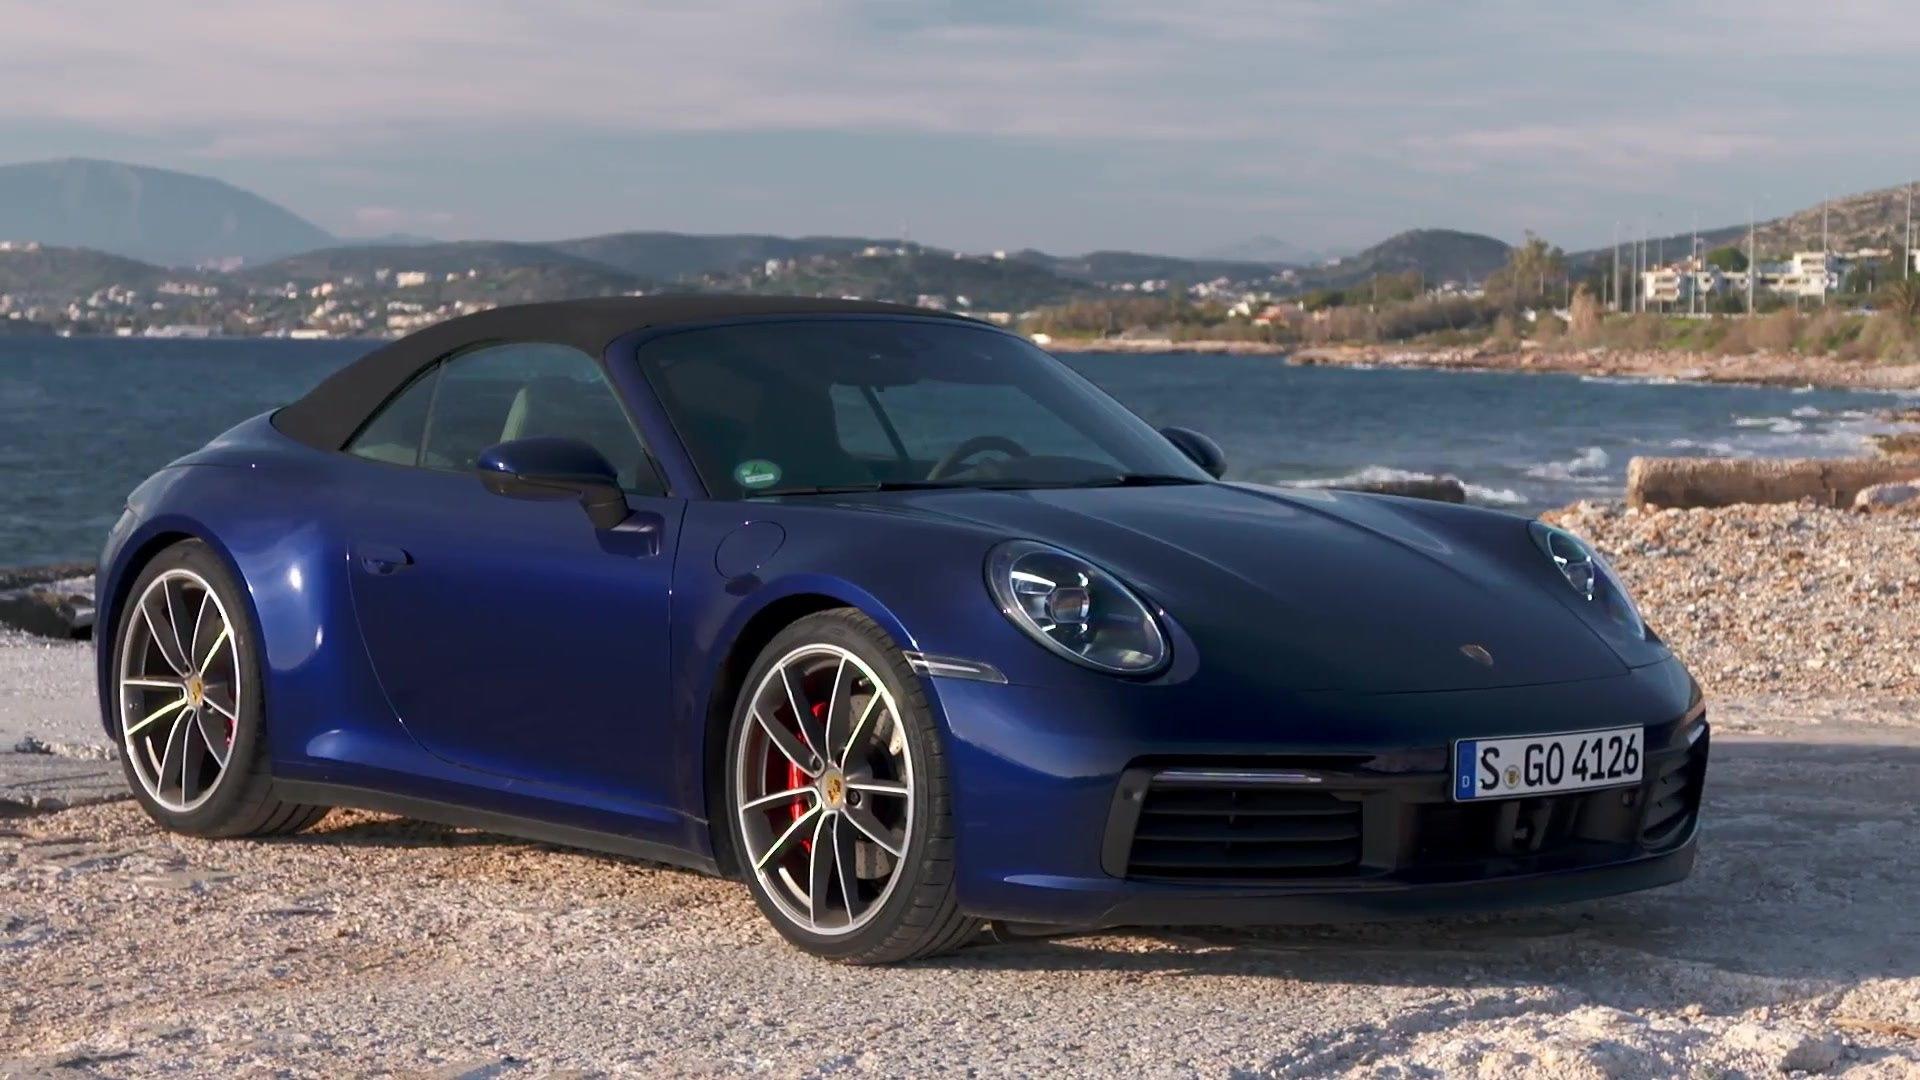 Porsche 911 Carrera 4s Cabriolet Design In Gentian Blue Metallic Video Dailymotion